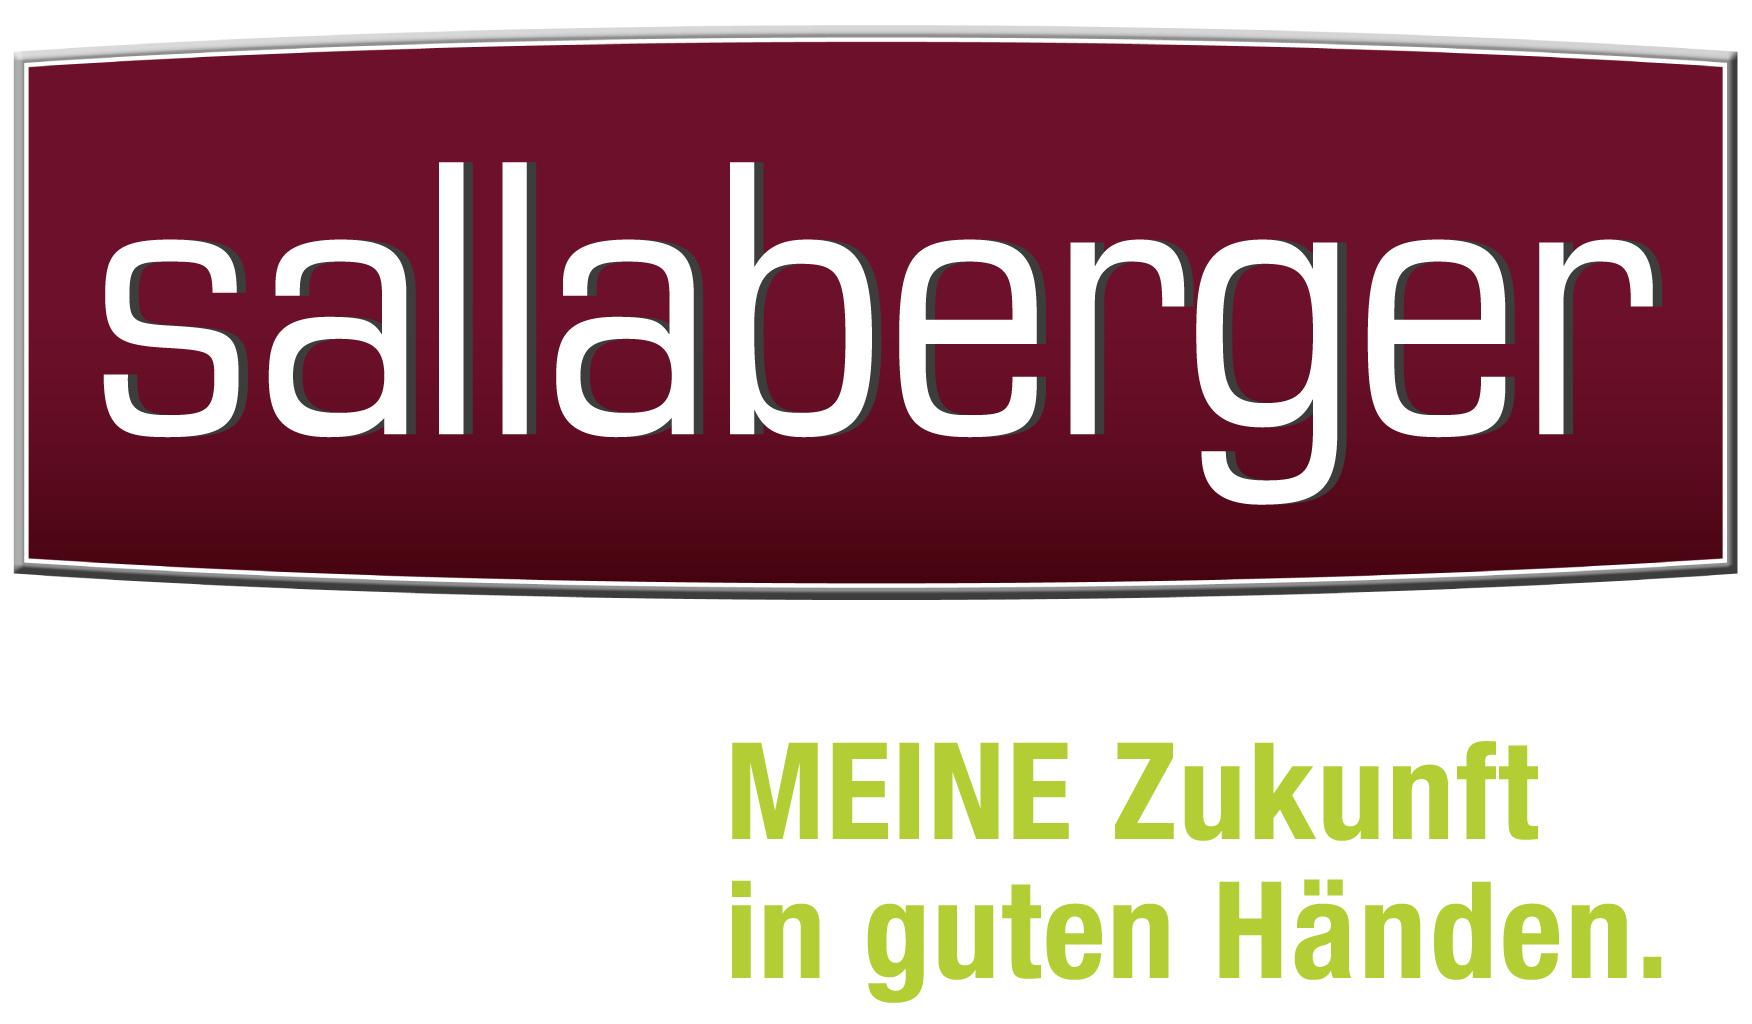 Sallaberger-Logo_neg_2014_4c